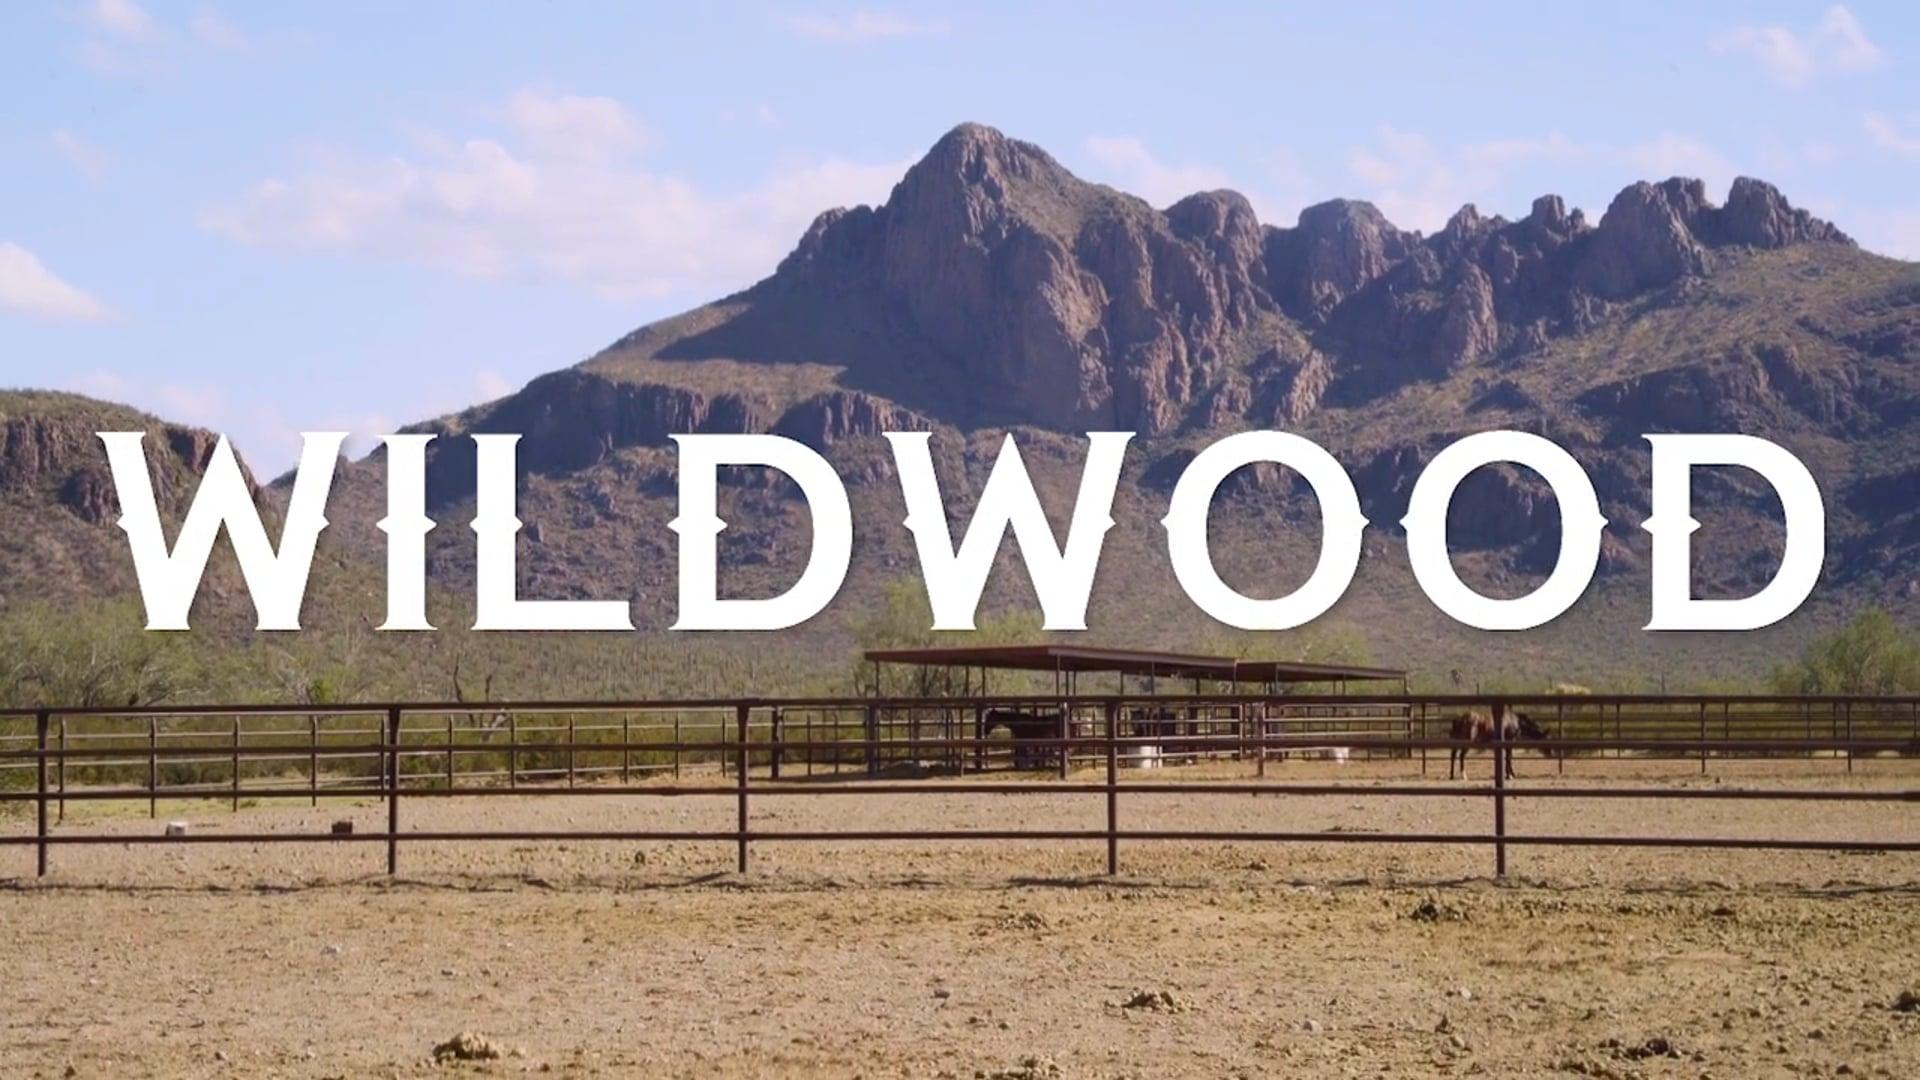 TAMGA - Wildwood (Tucson)